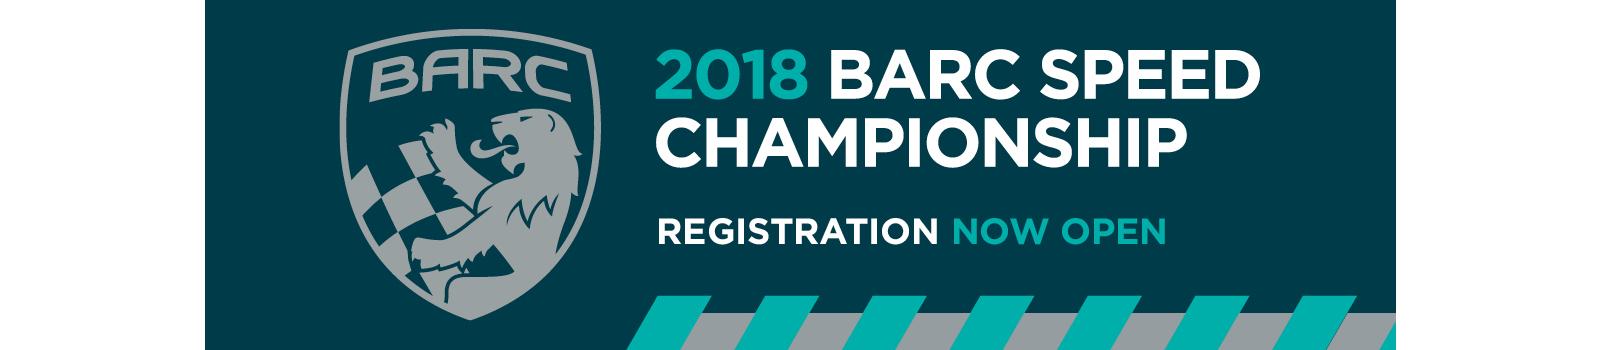 2018 Speed Championship - Registration Now Open